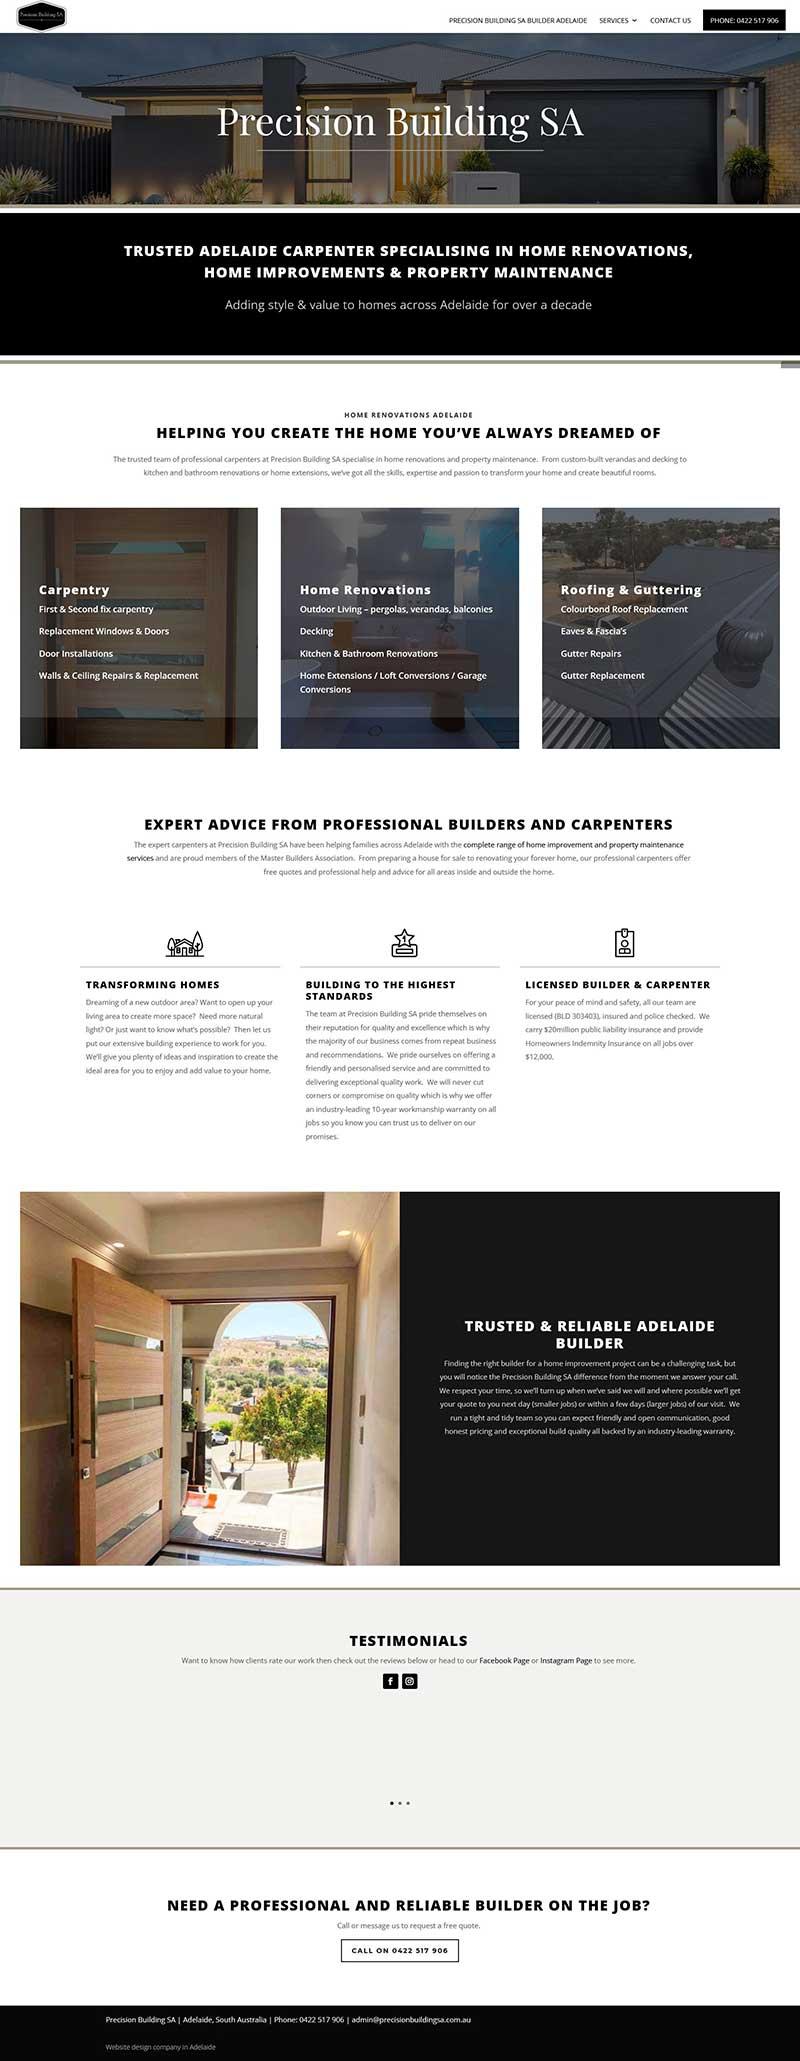 website design in adelaide house builder renovations